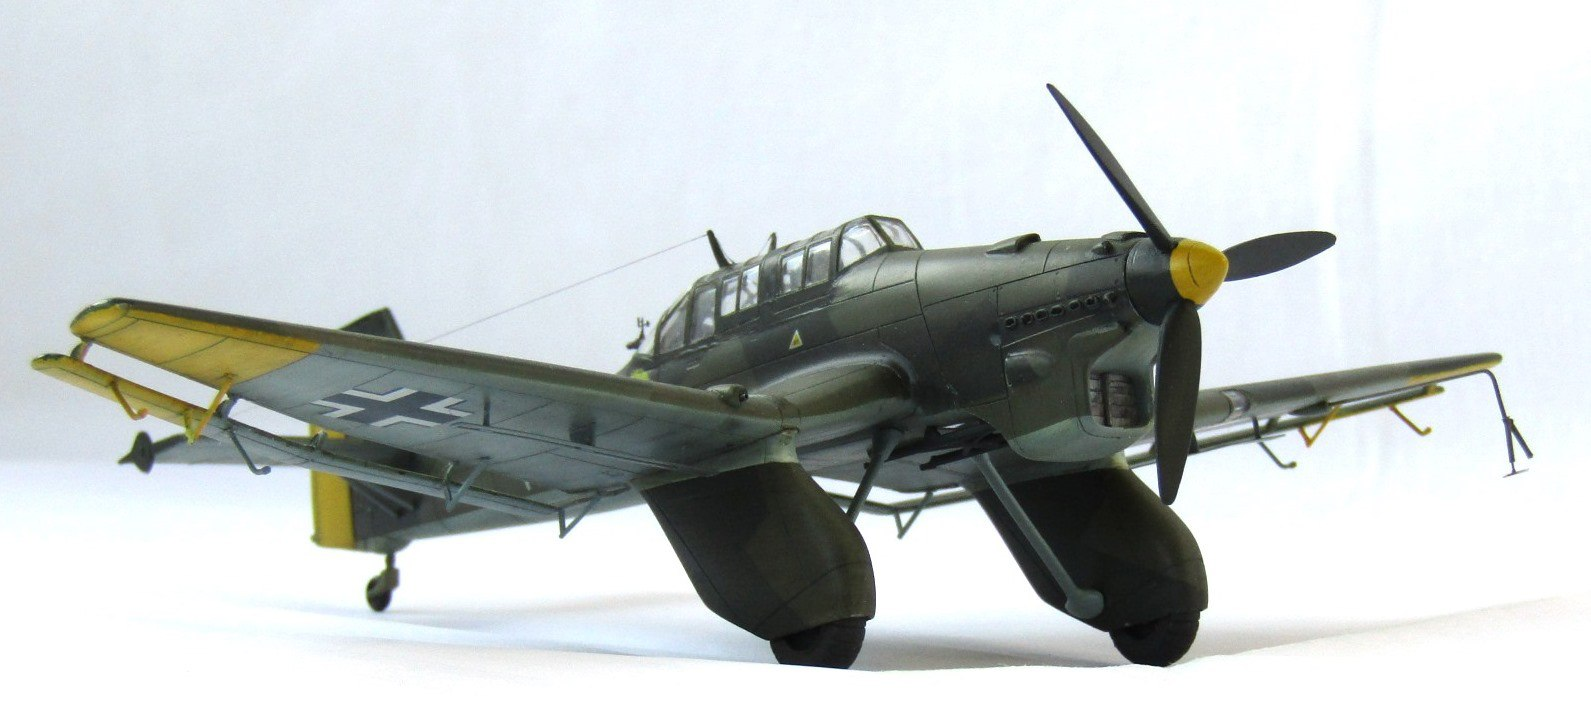 Ju-87A 1/72 (Special Hobby) _5VxERpcbkk